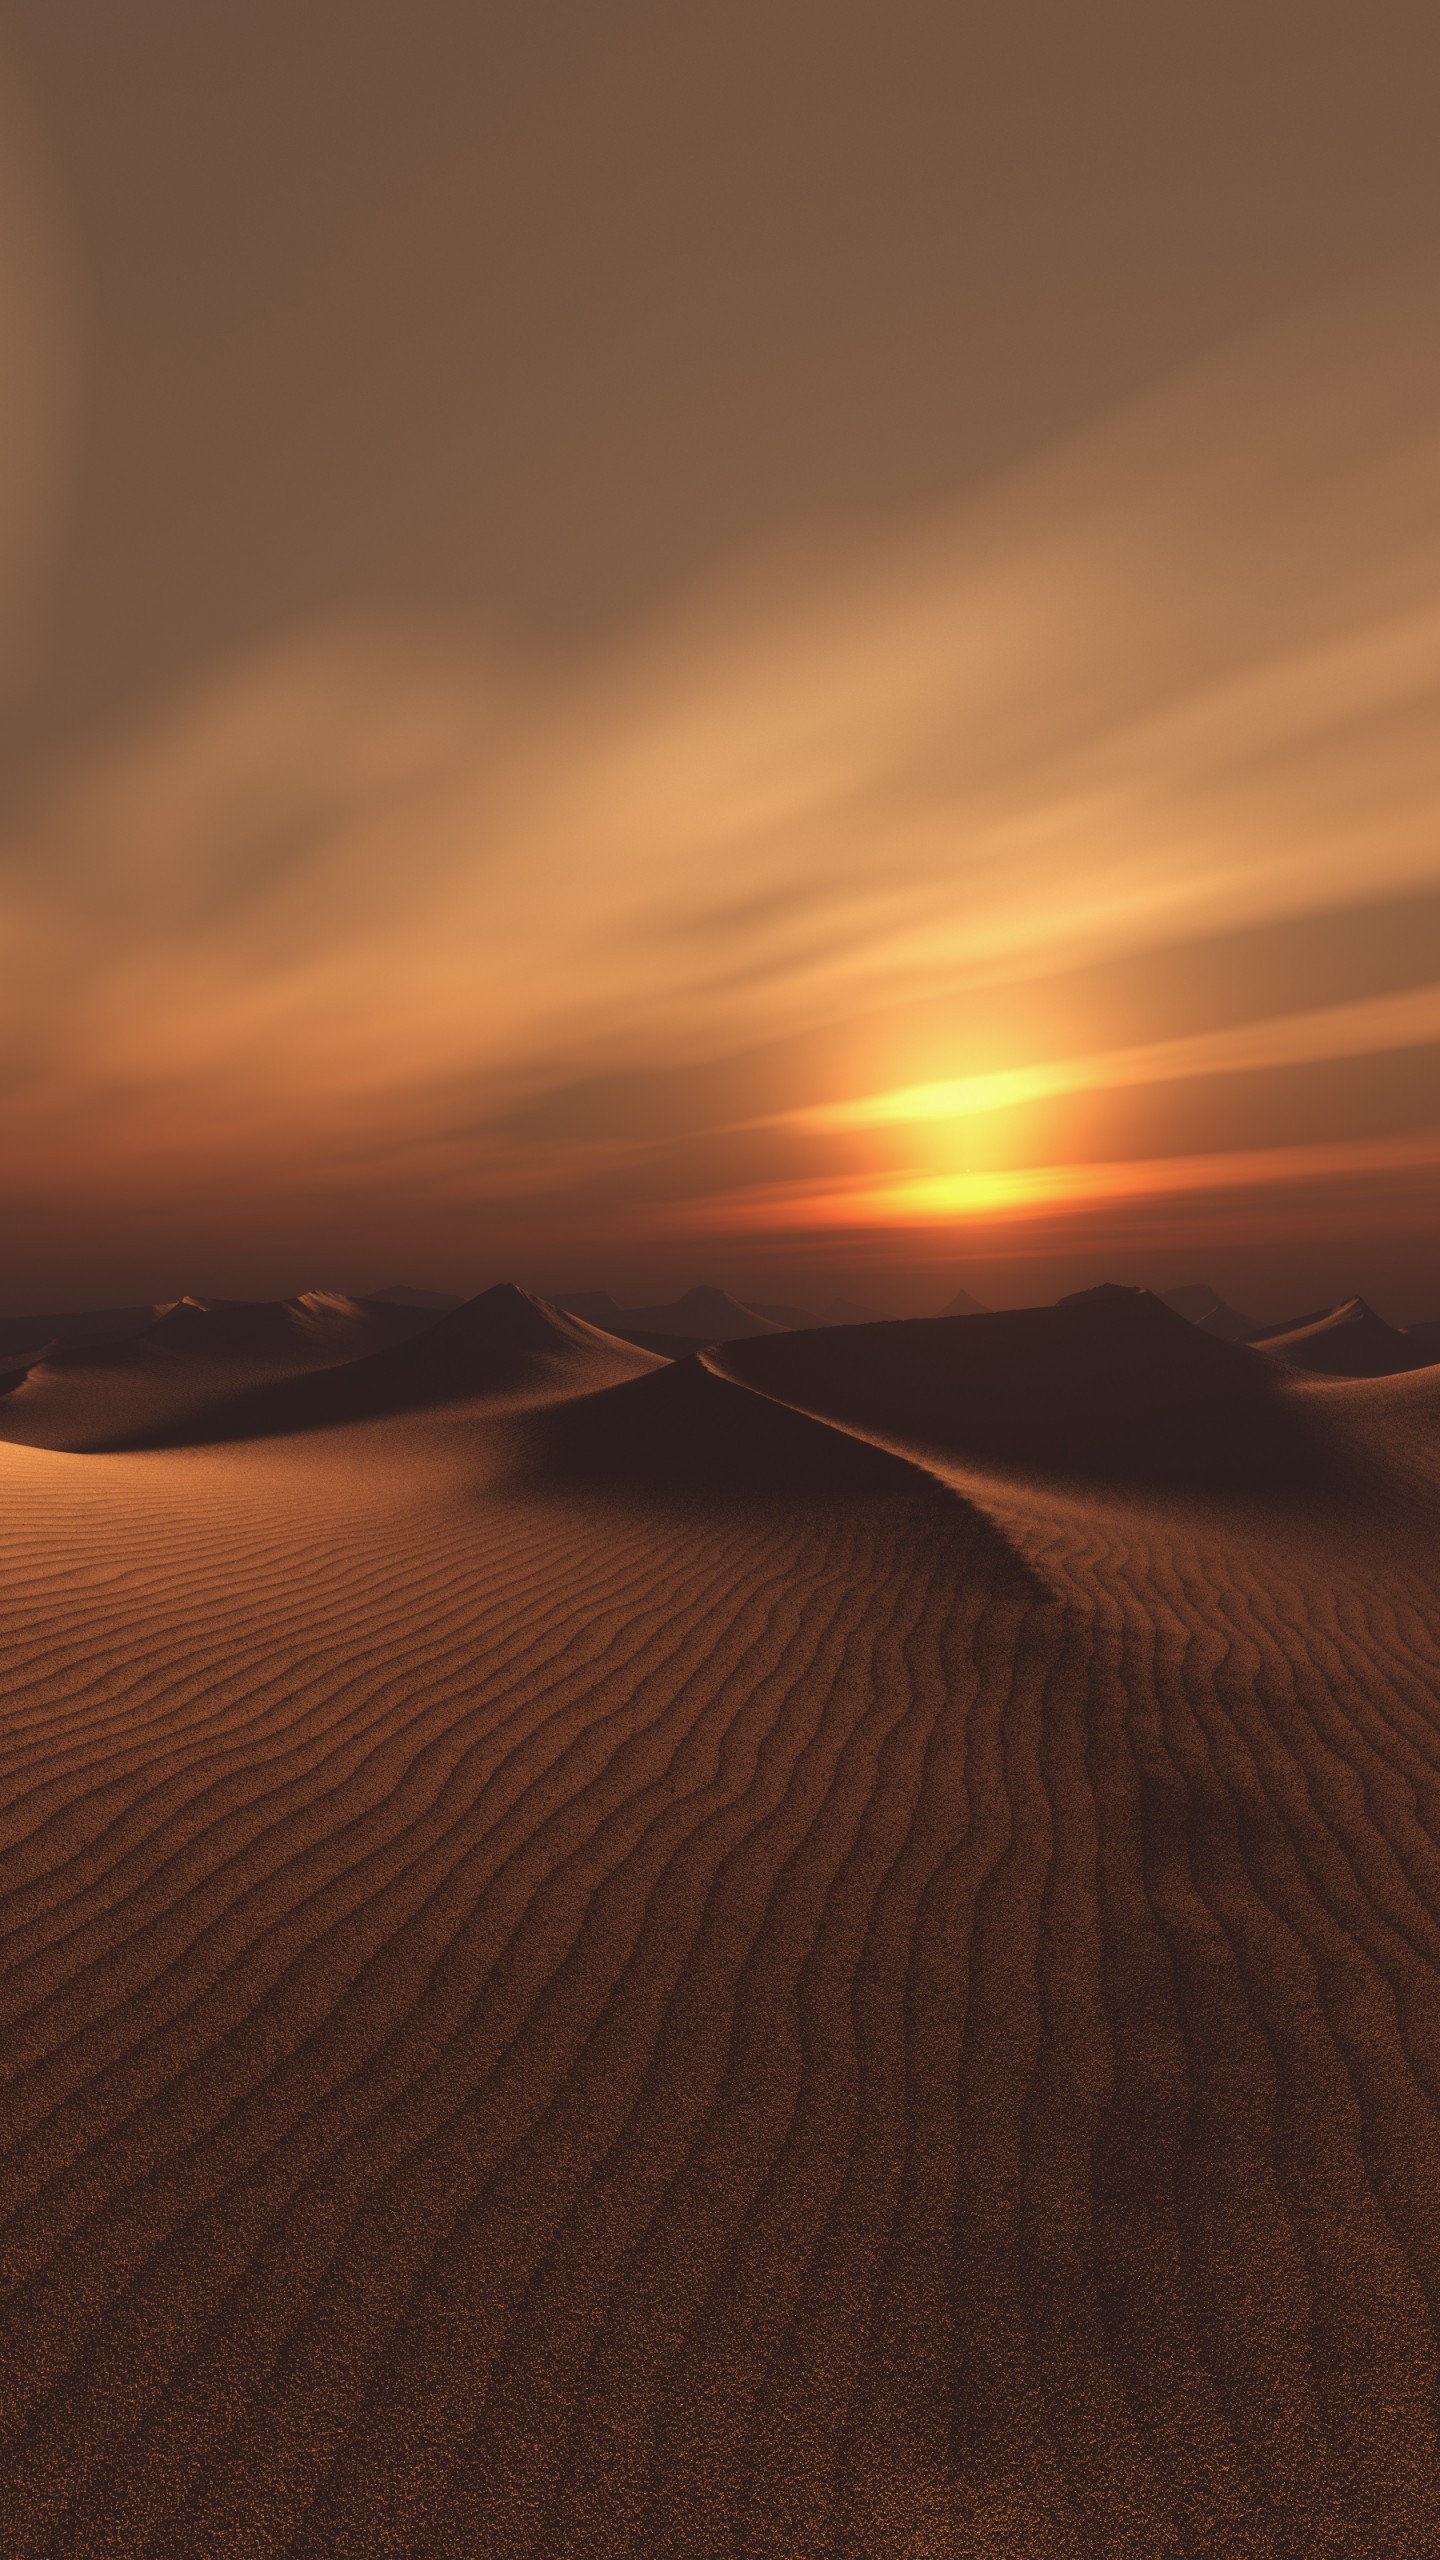 عکس زمینه غروب آفتاب در کویر گرم رویایی پس زمینه